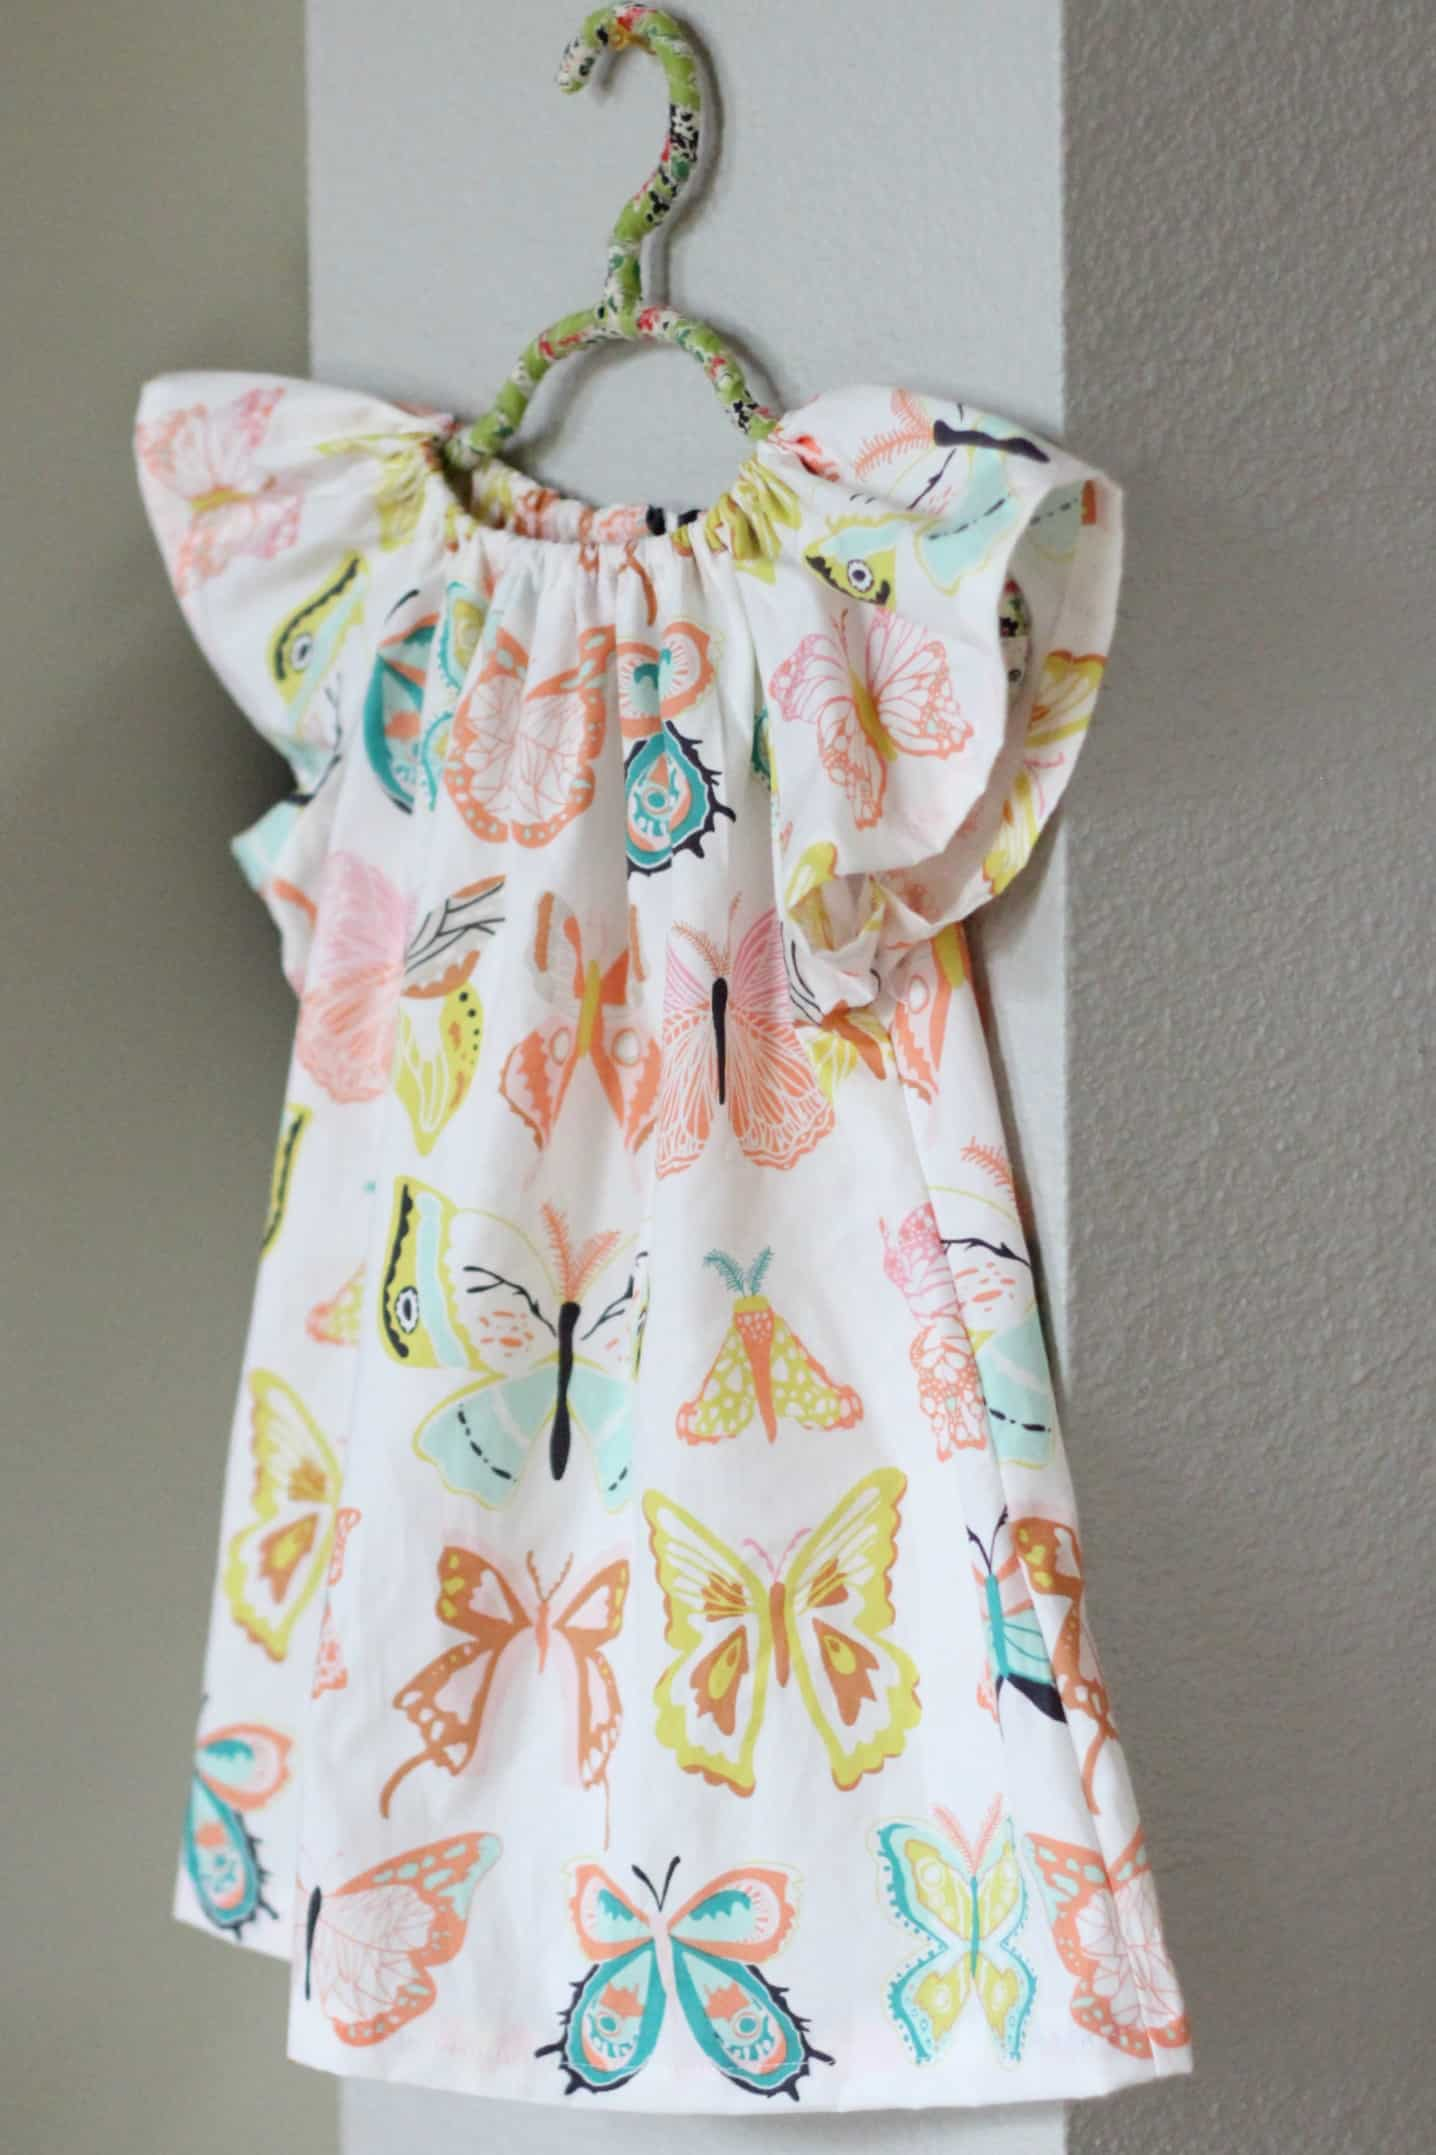 Cute singed peasant dress